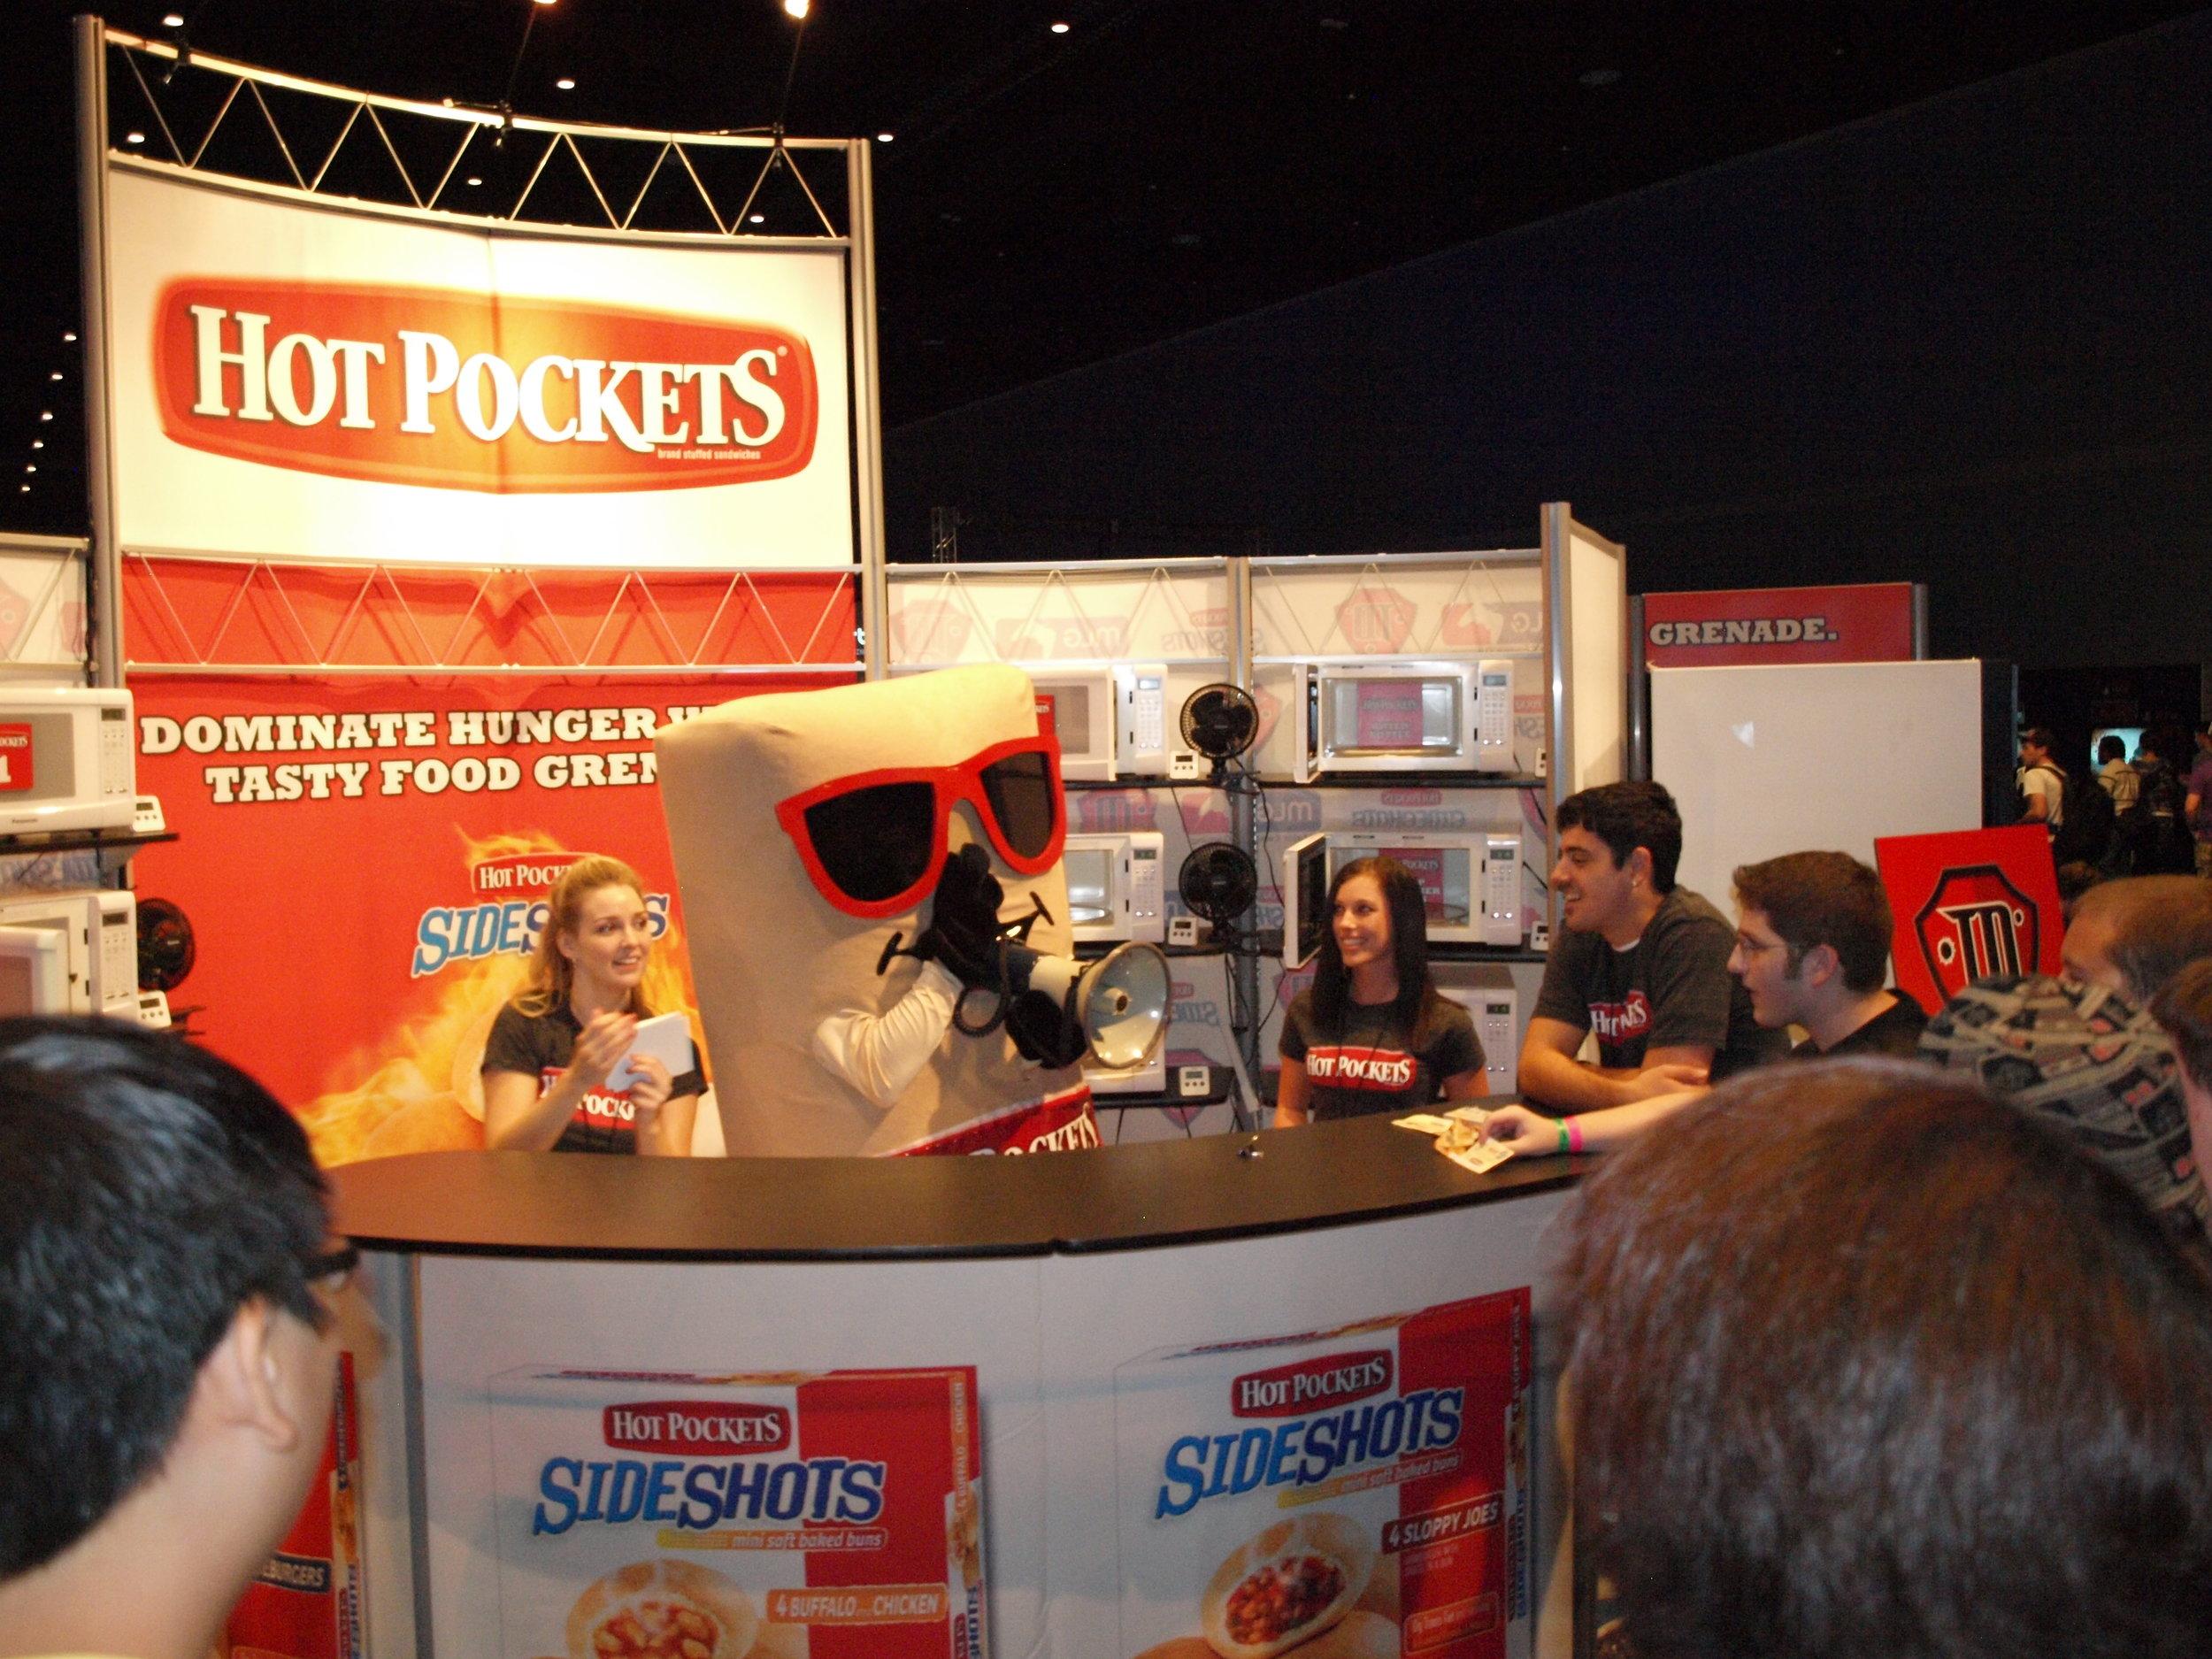 Nestlé/Hot Pockets - MLG Sponsorship: Mascot & Booth